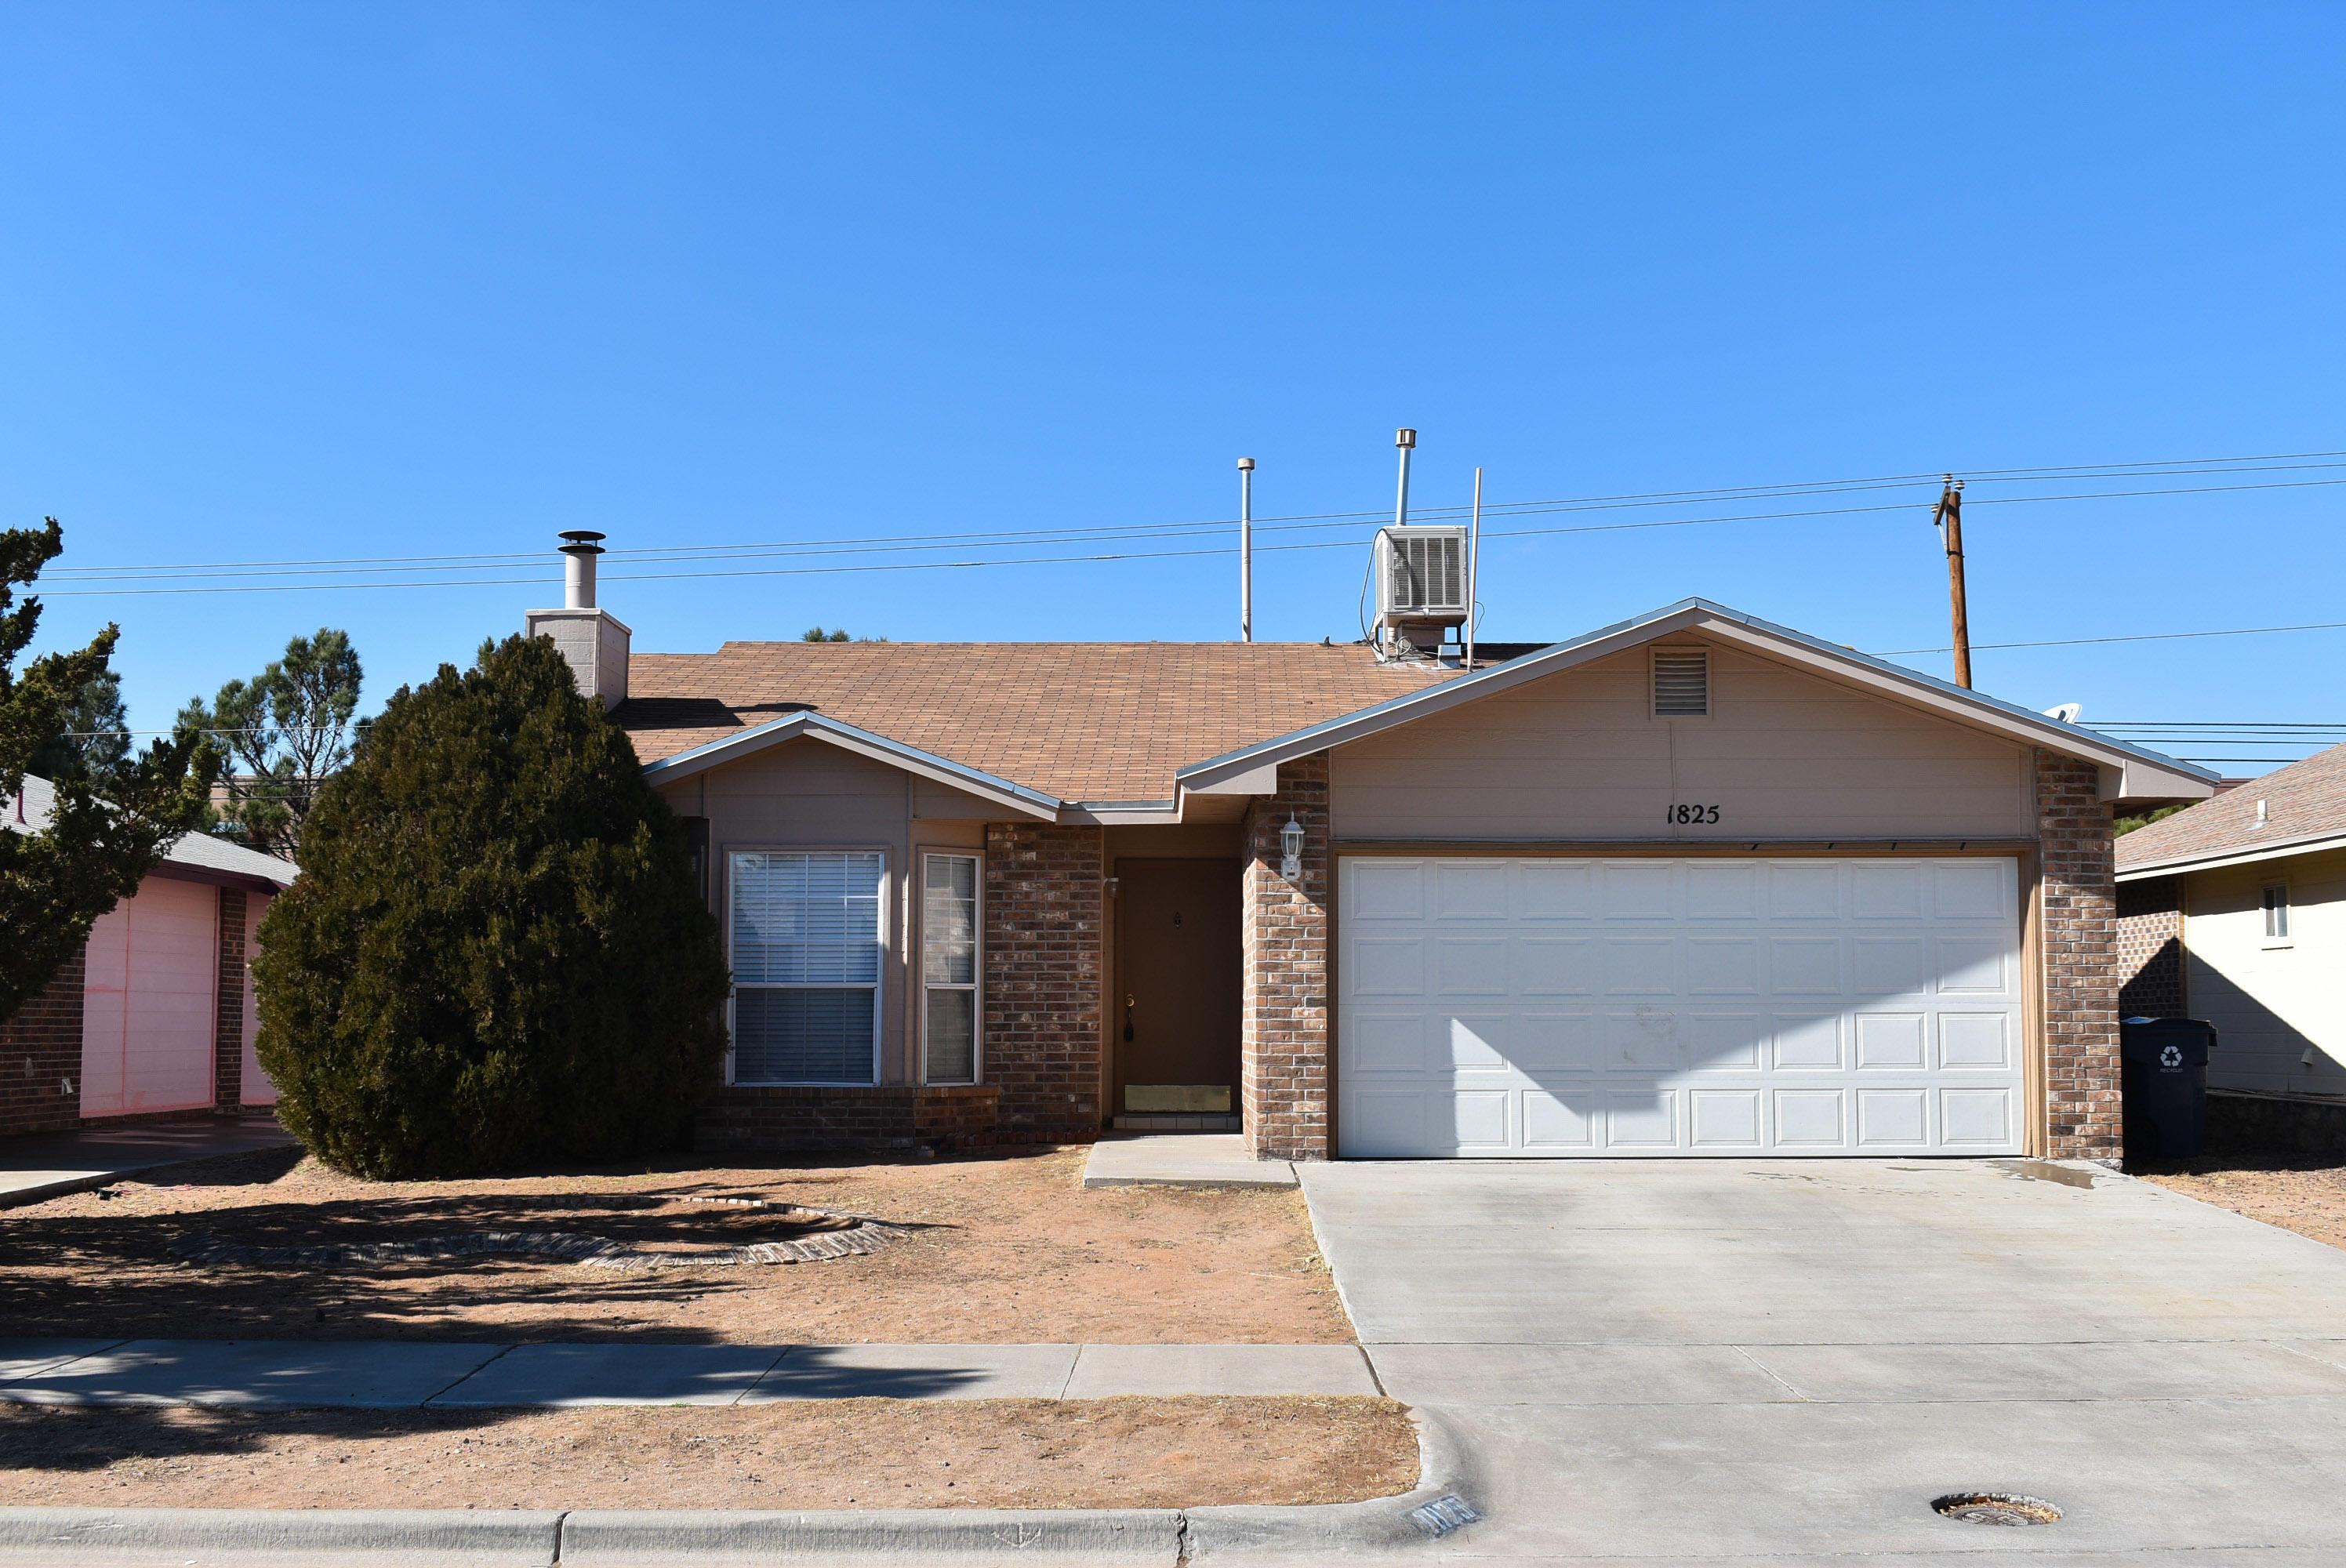 1825 Jean Louise Street, El Paso, Texas 79936, 3 Bedrooms Bedrooms, ,2 BathroomsBathrooms,Residential Rental,For Rent,Jean Louise,839943